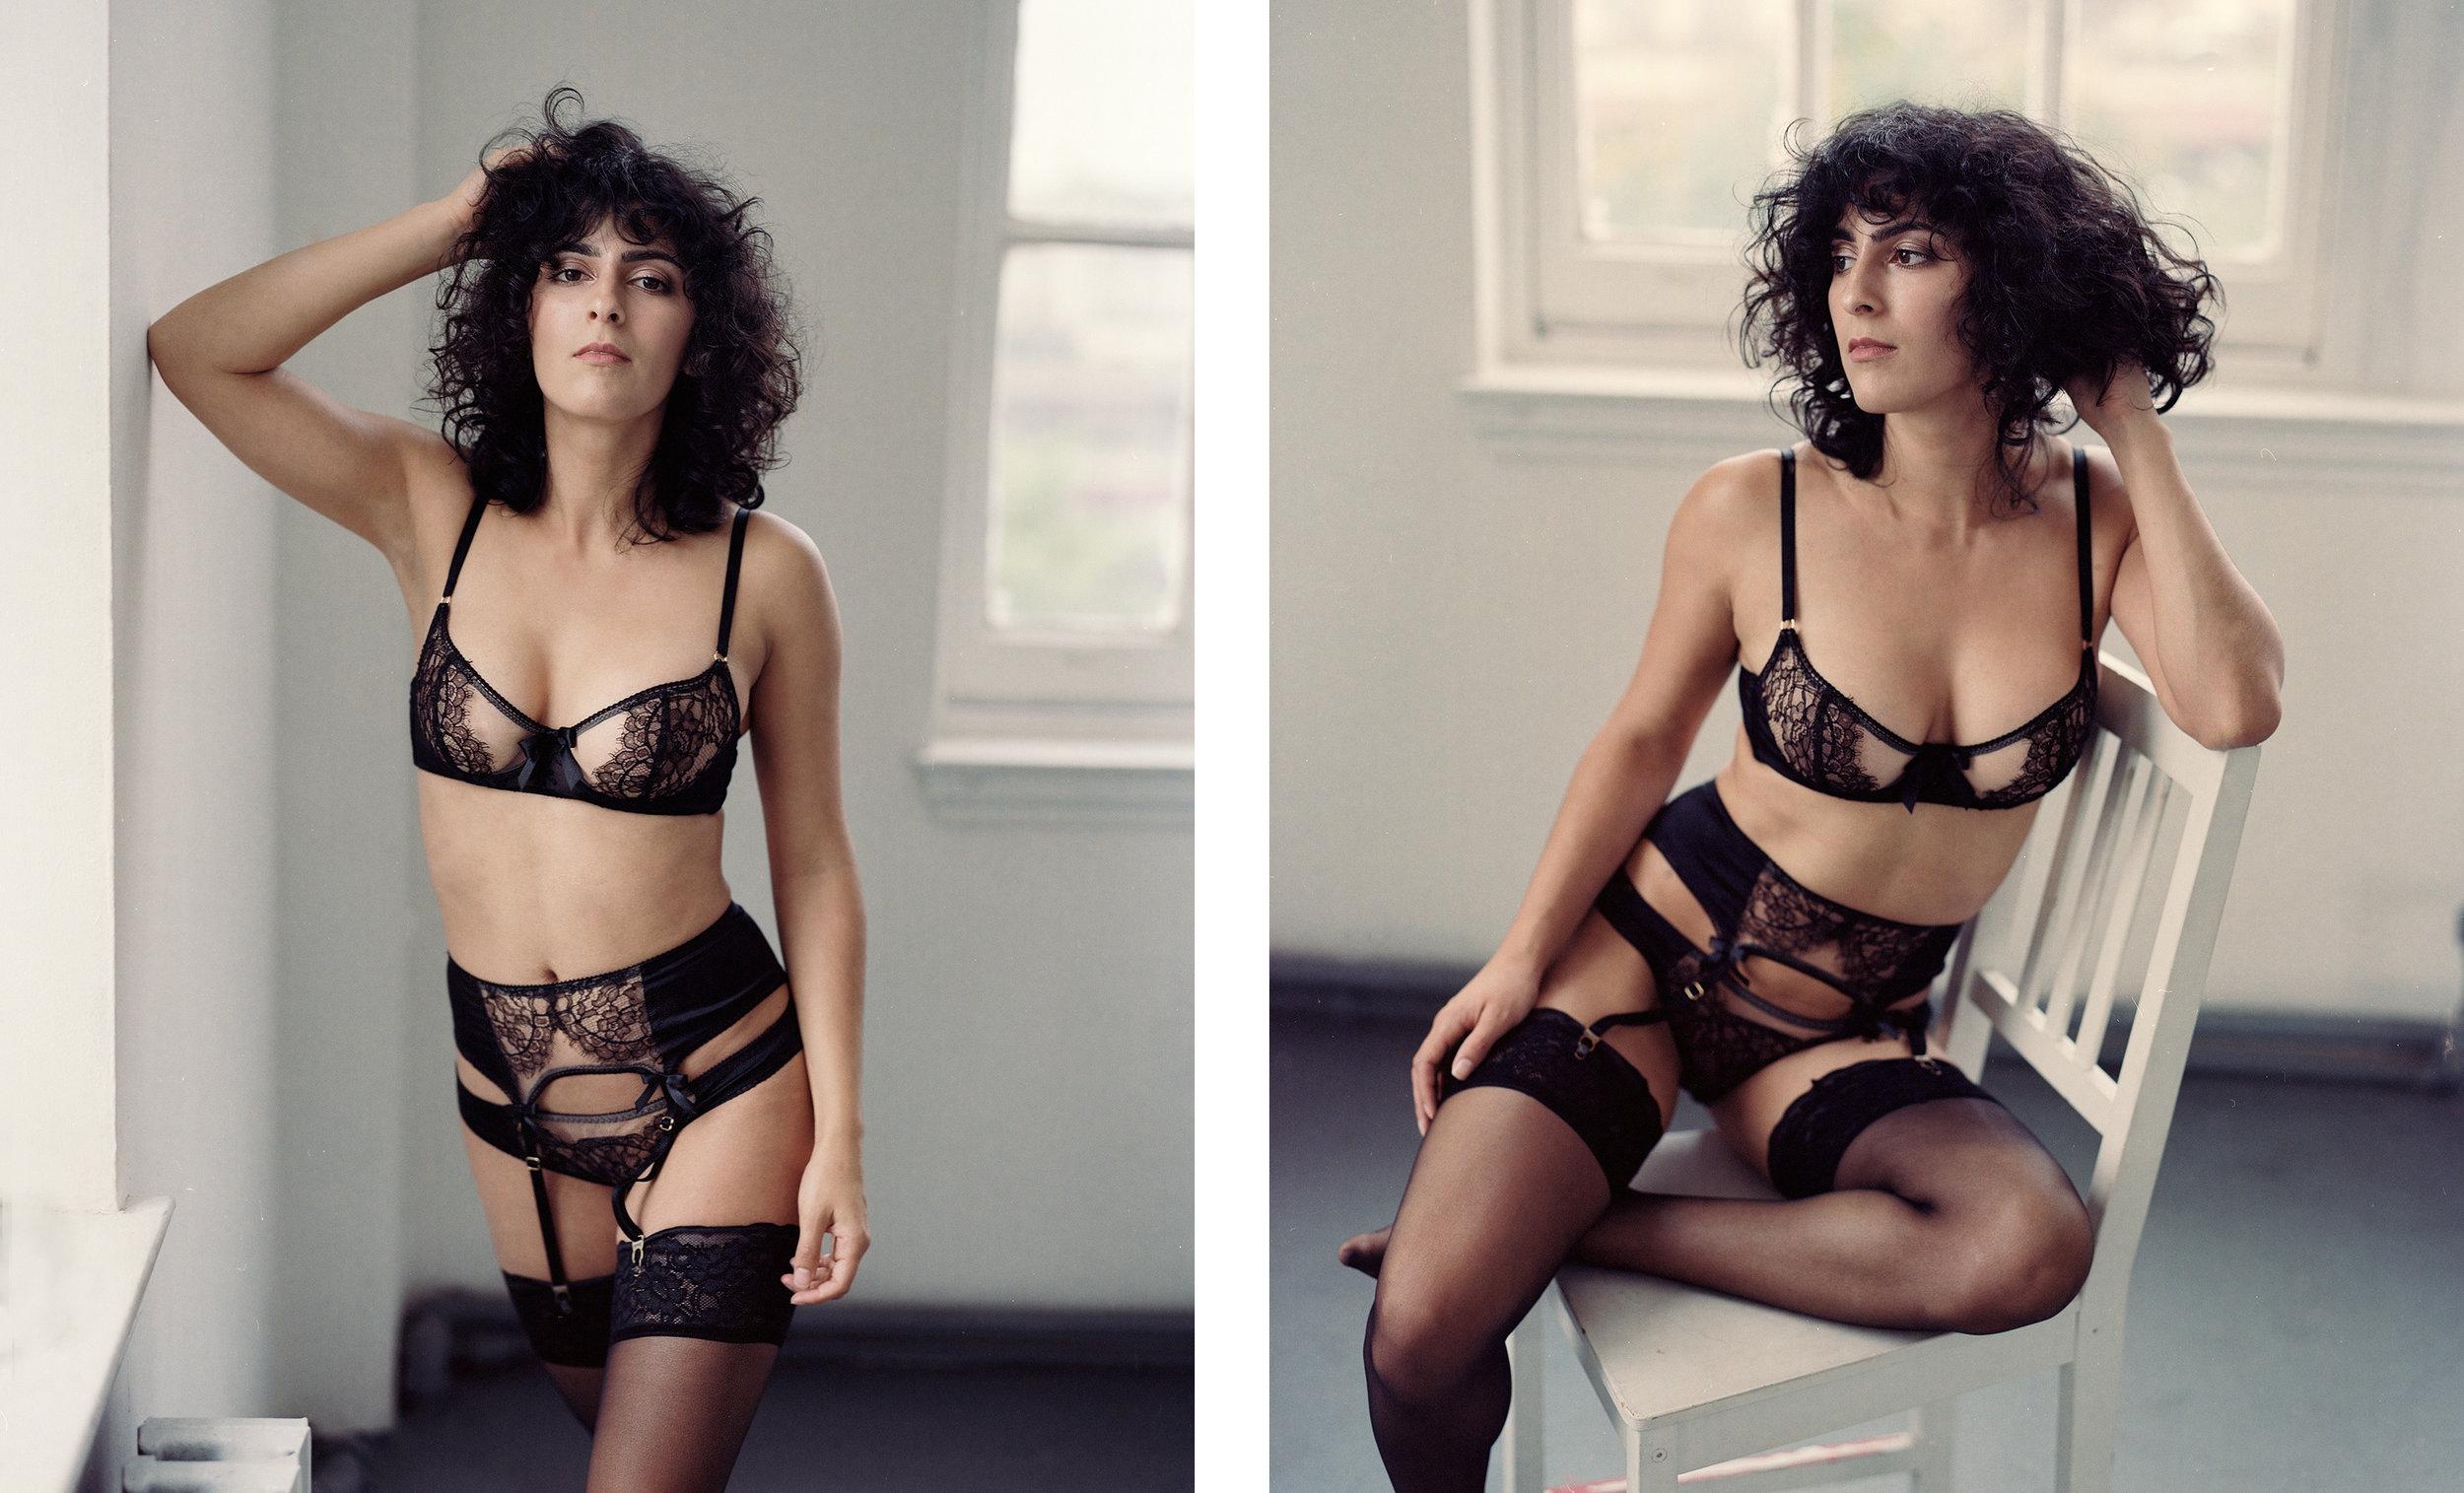 leah-beilhart-for-sofia-luzon-lingerie-photographer-dave-mentzer.jpg